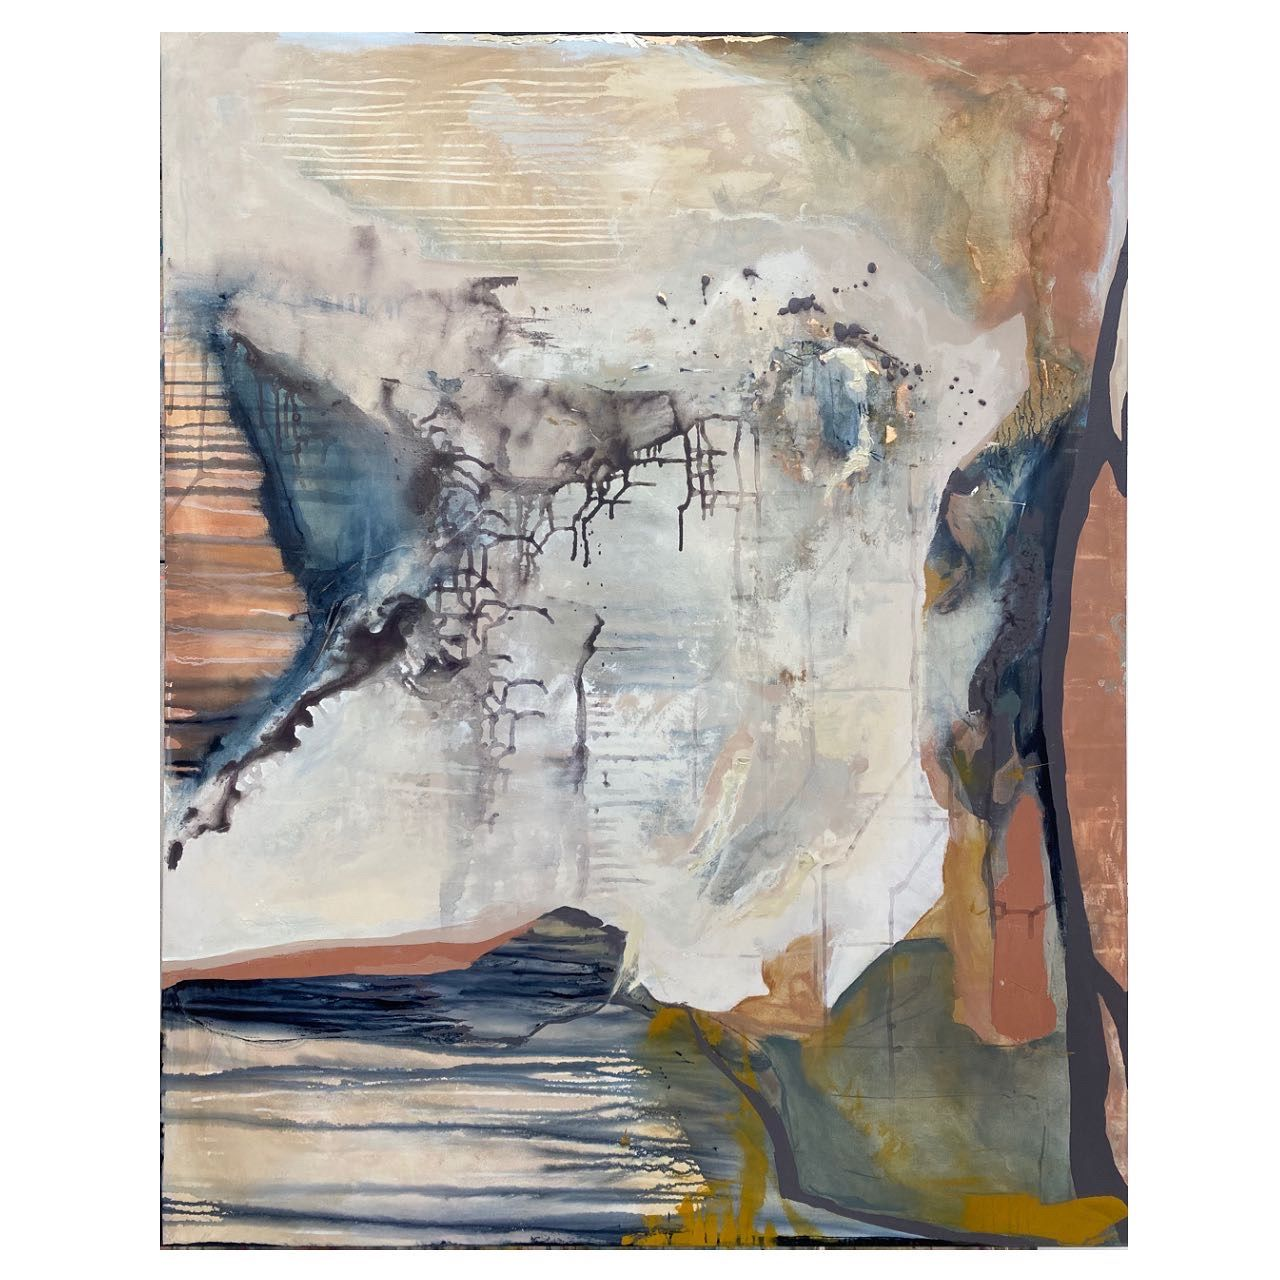 4ft x 5ft acrylic on canvas #abstractart #meribethprivettart #abstractartists